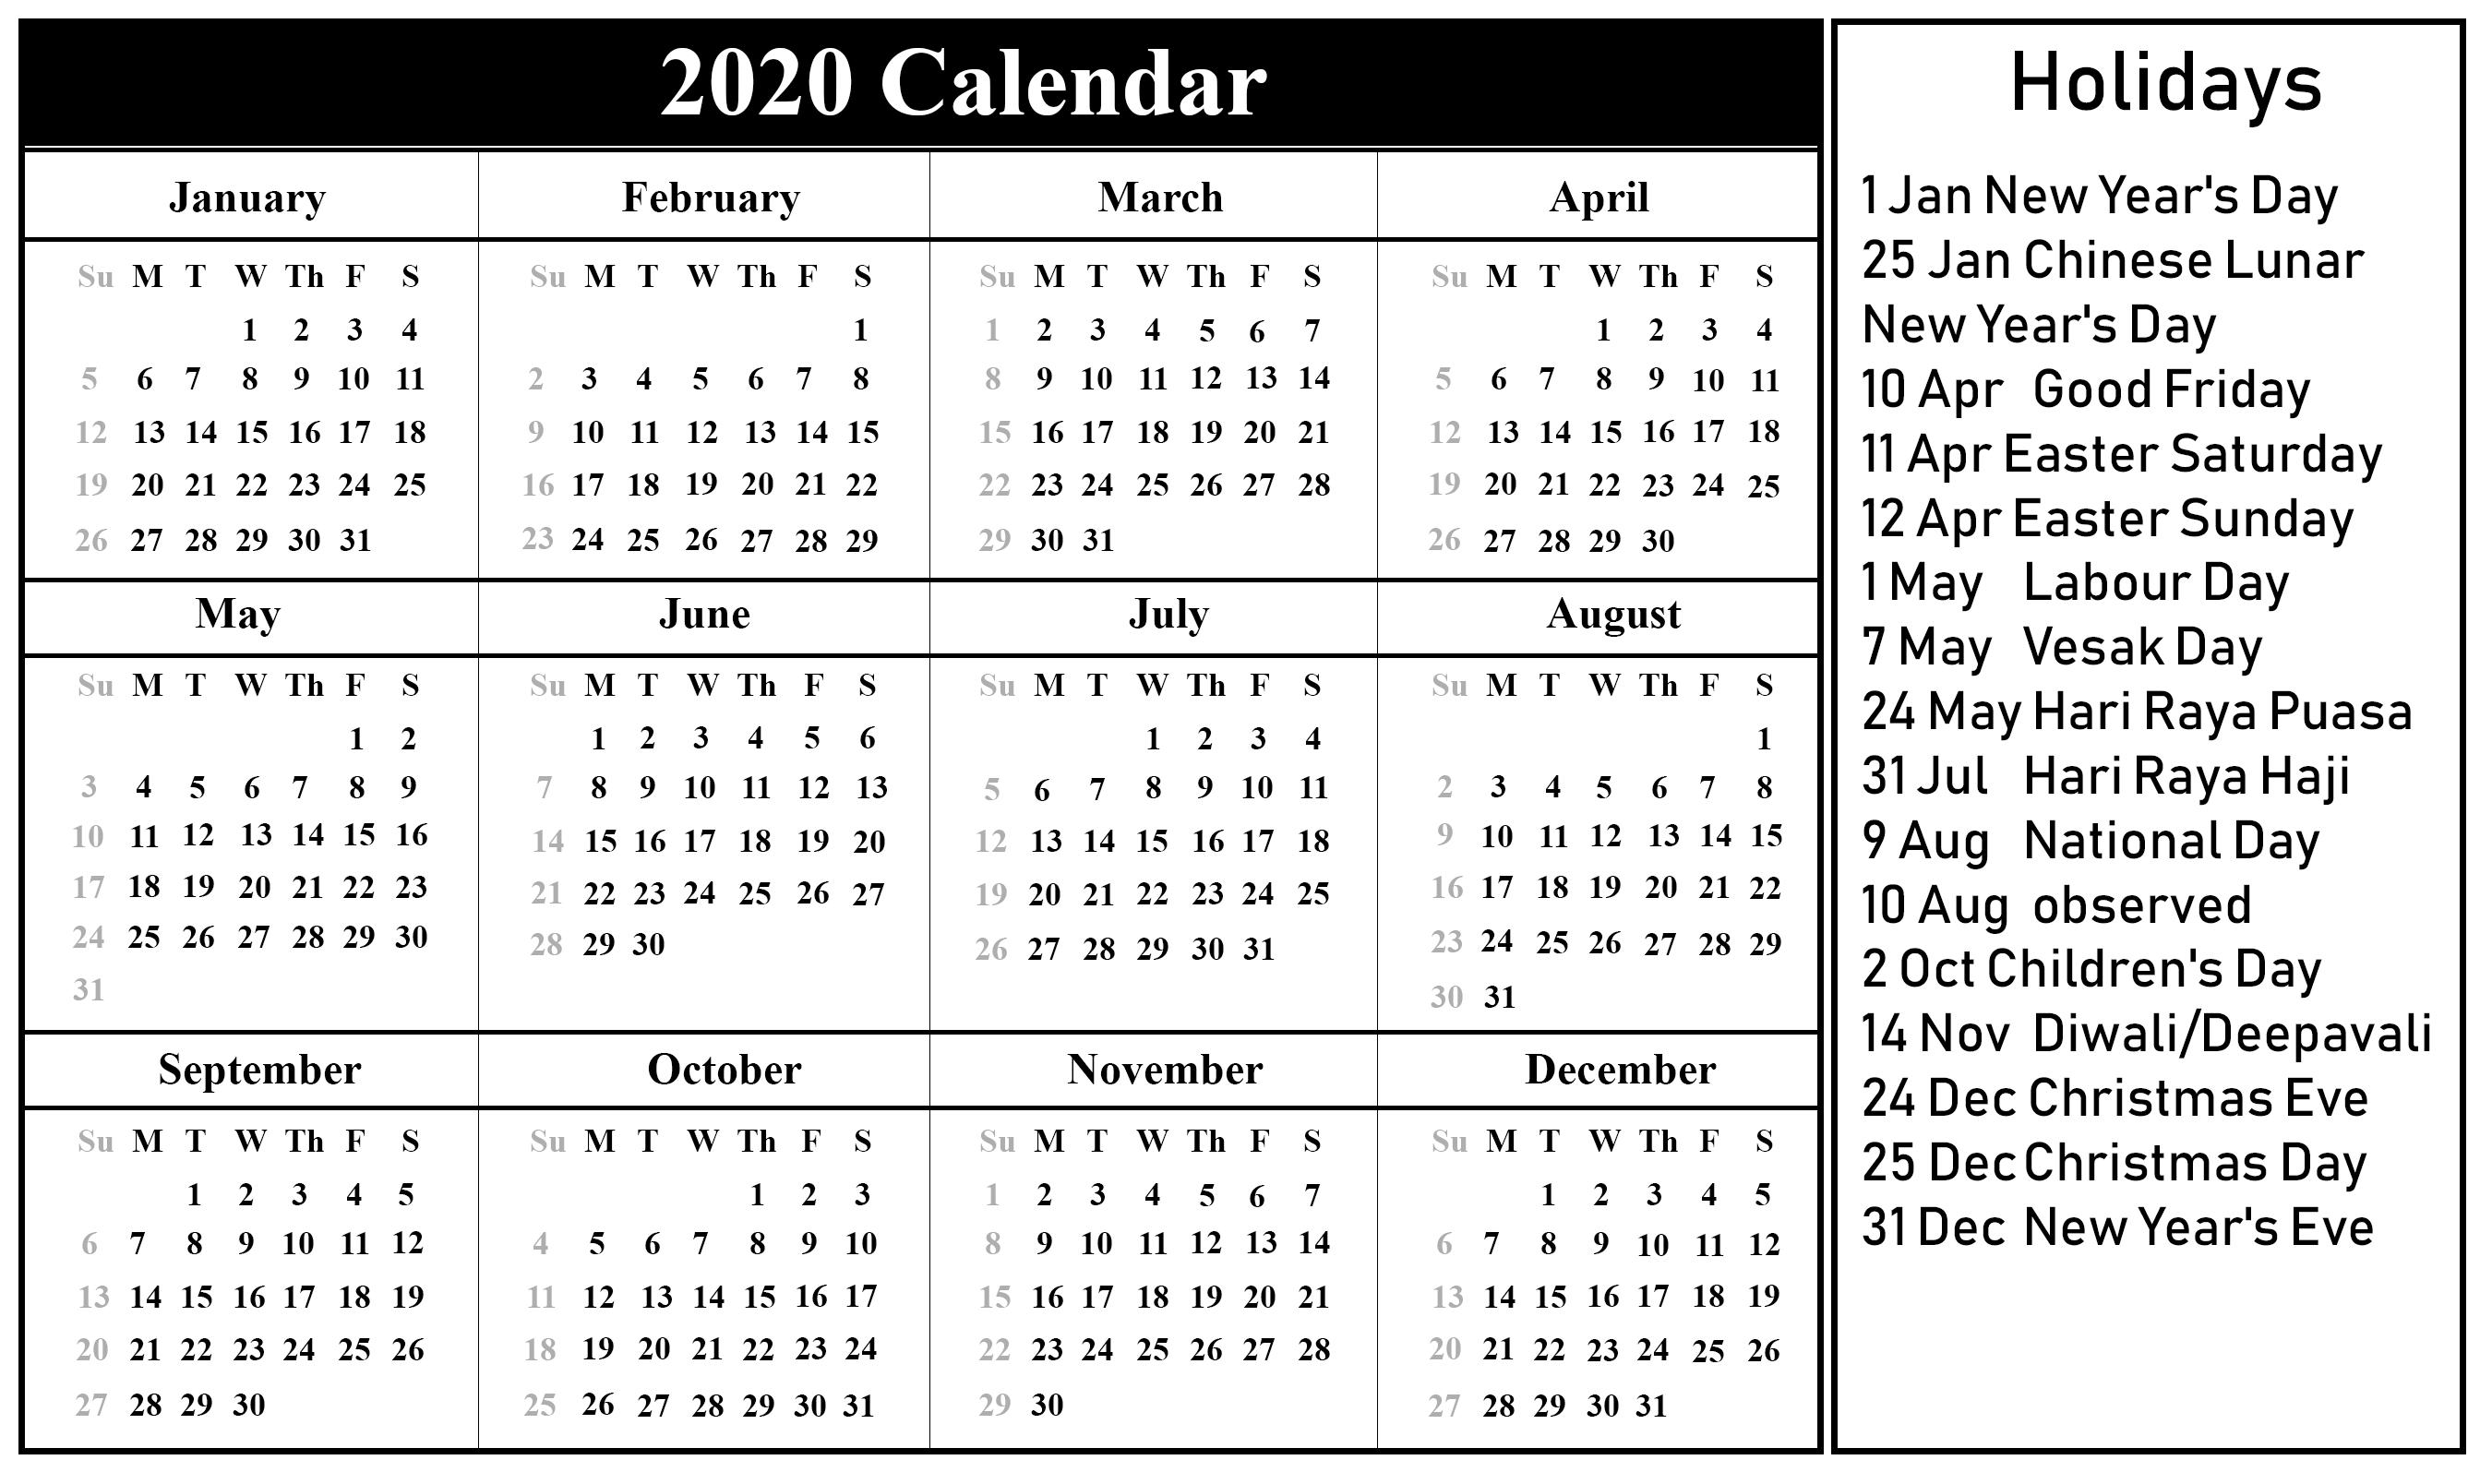 Printable 2020 Calendar With Holidays | Monthly Calendar Christmas Calendar 2020 Printable Free